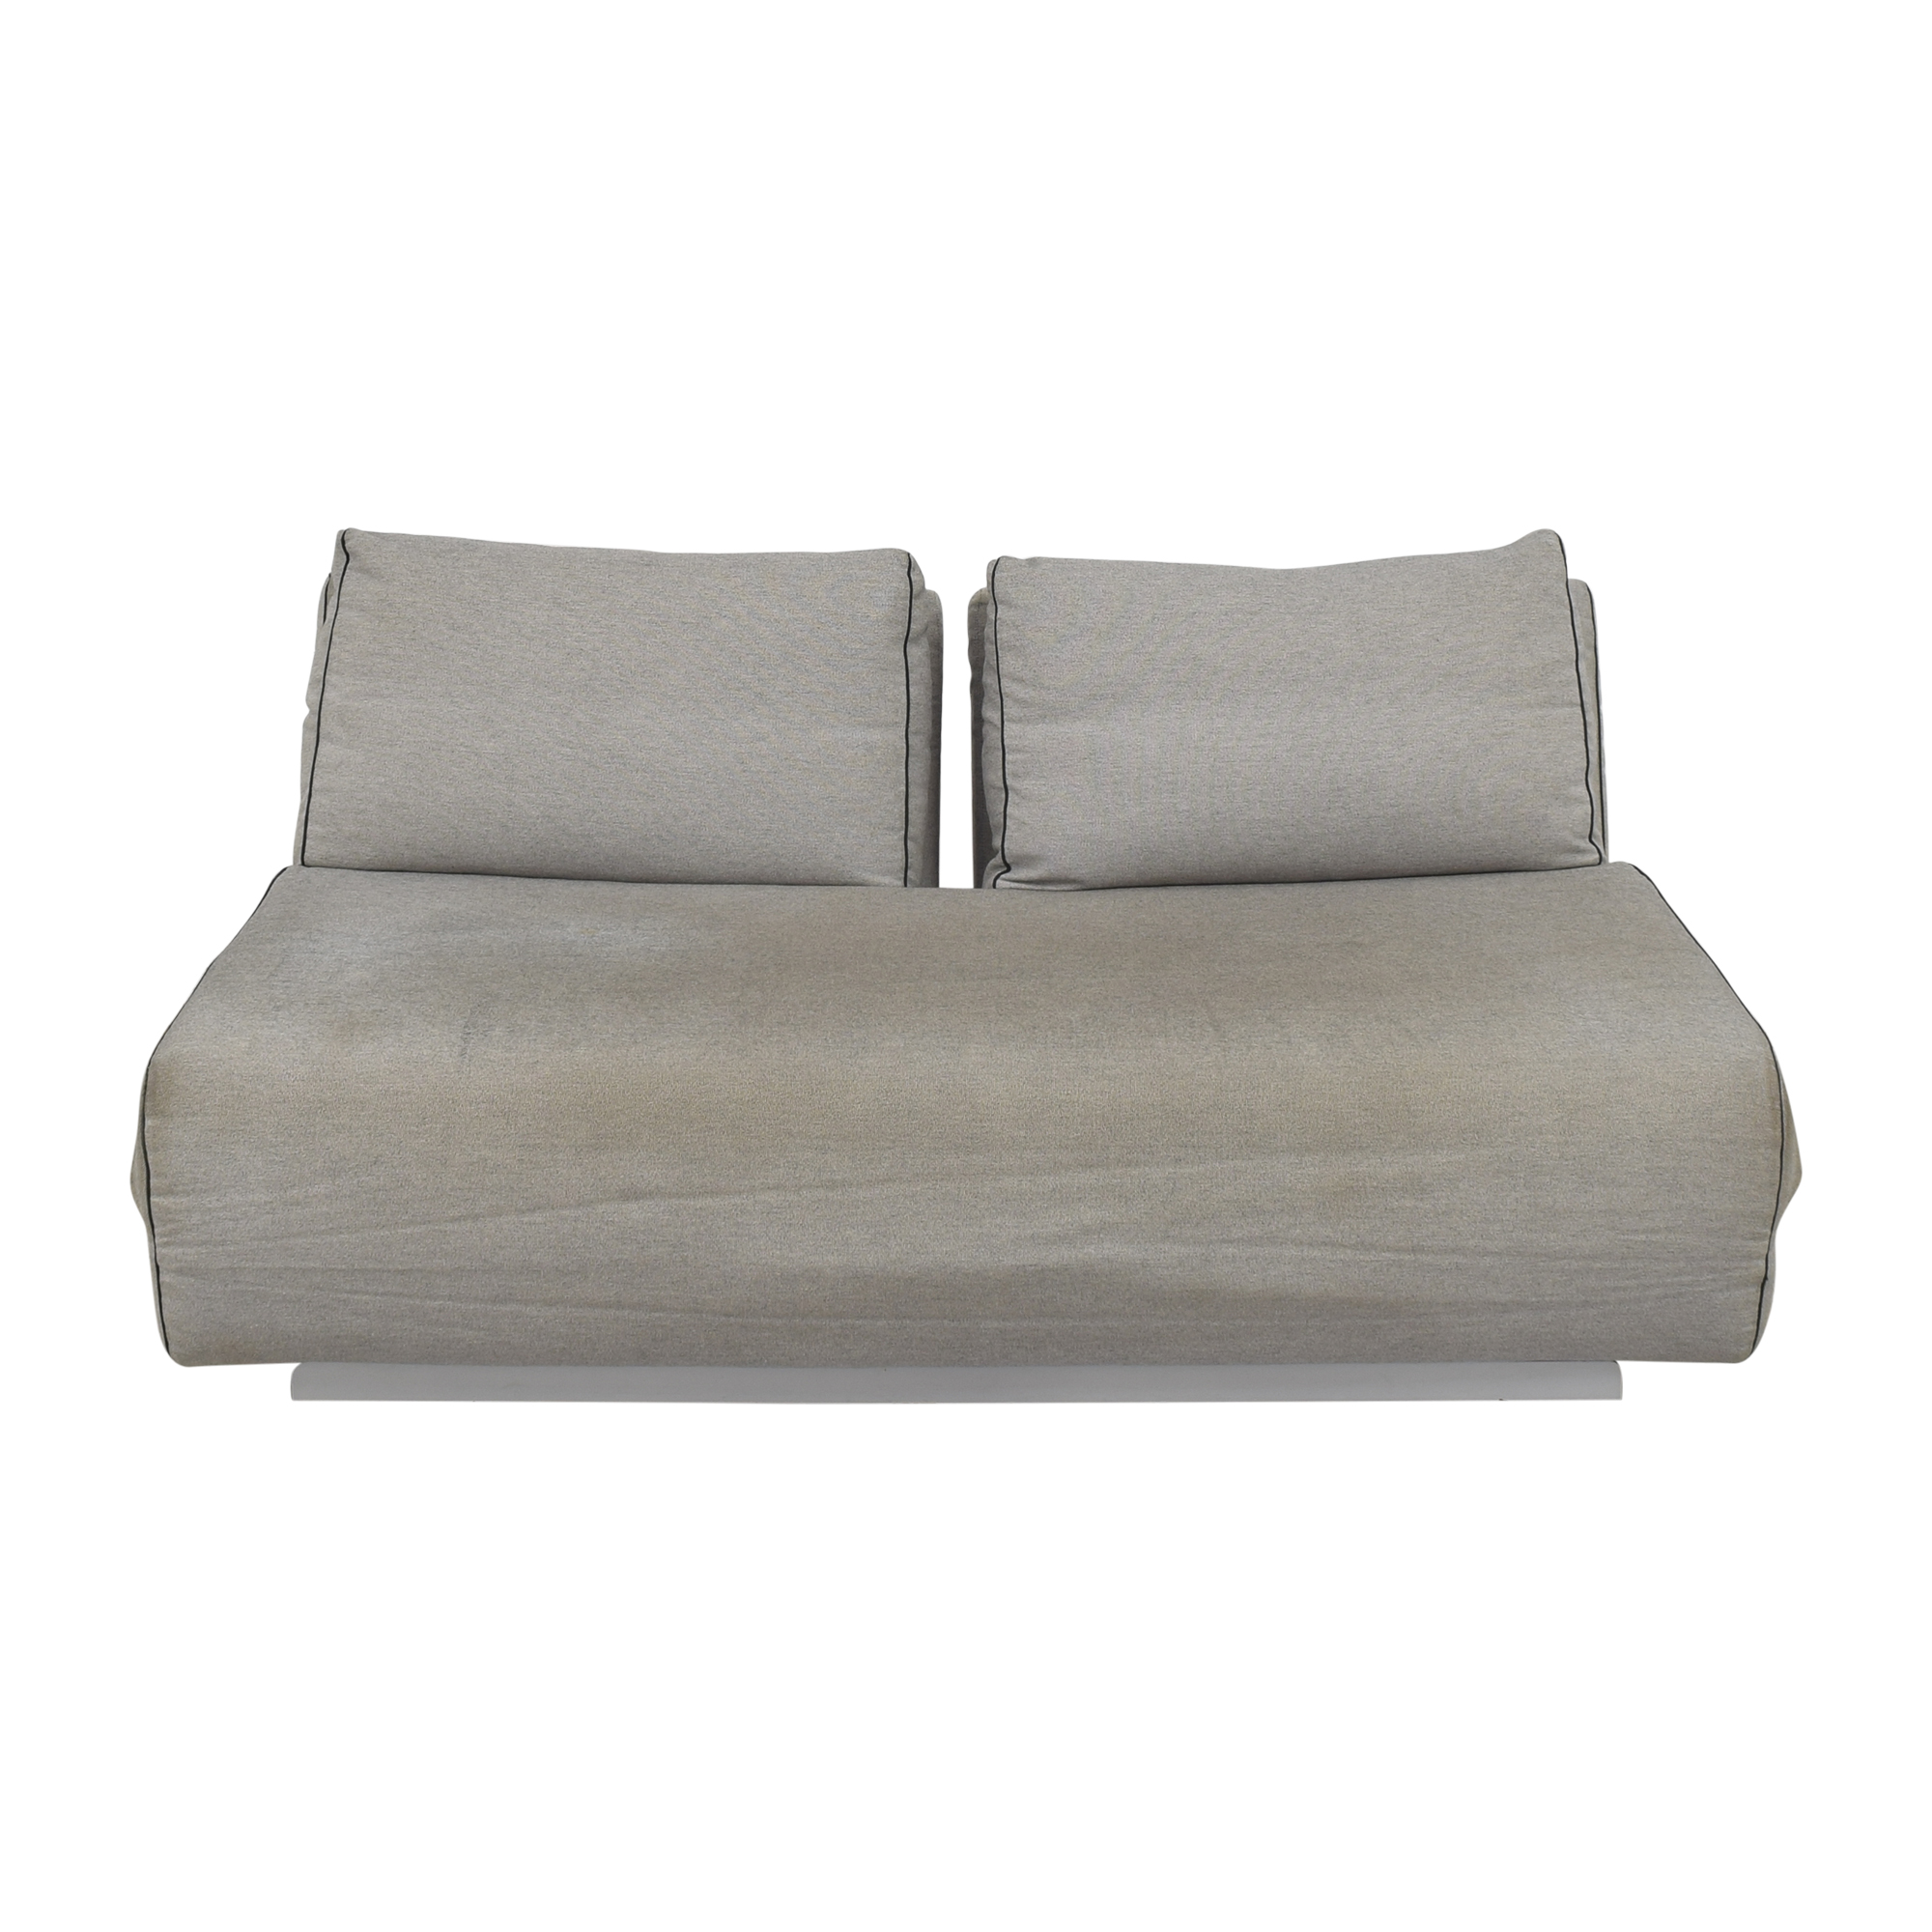 Softline City 2.5 Seater Sofa Bed / Sofas